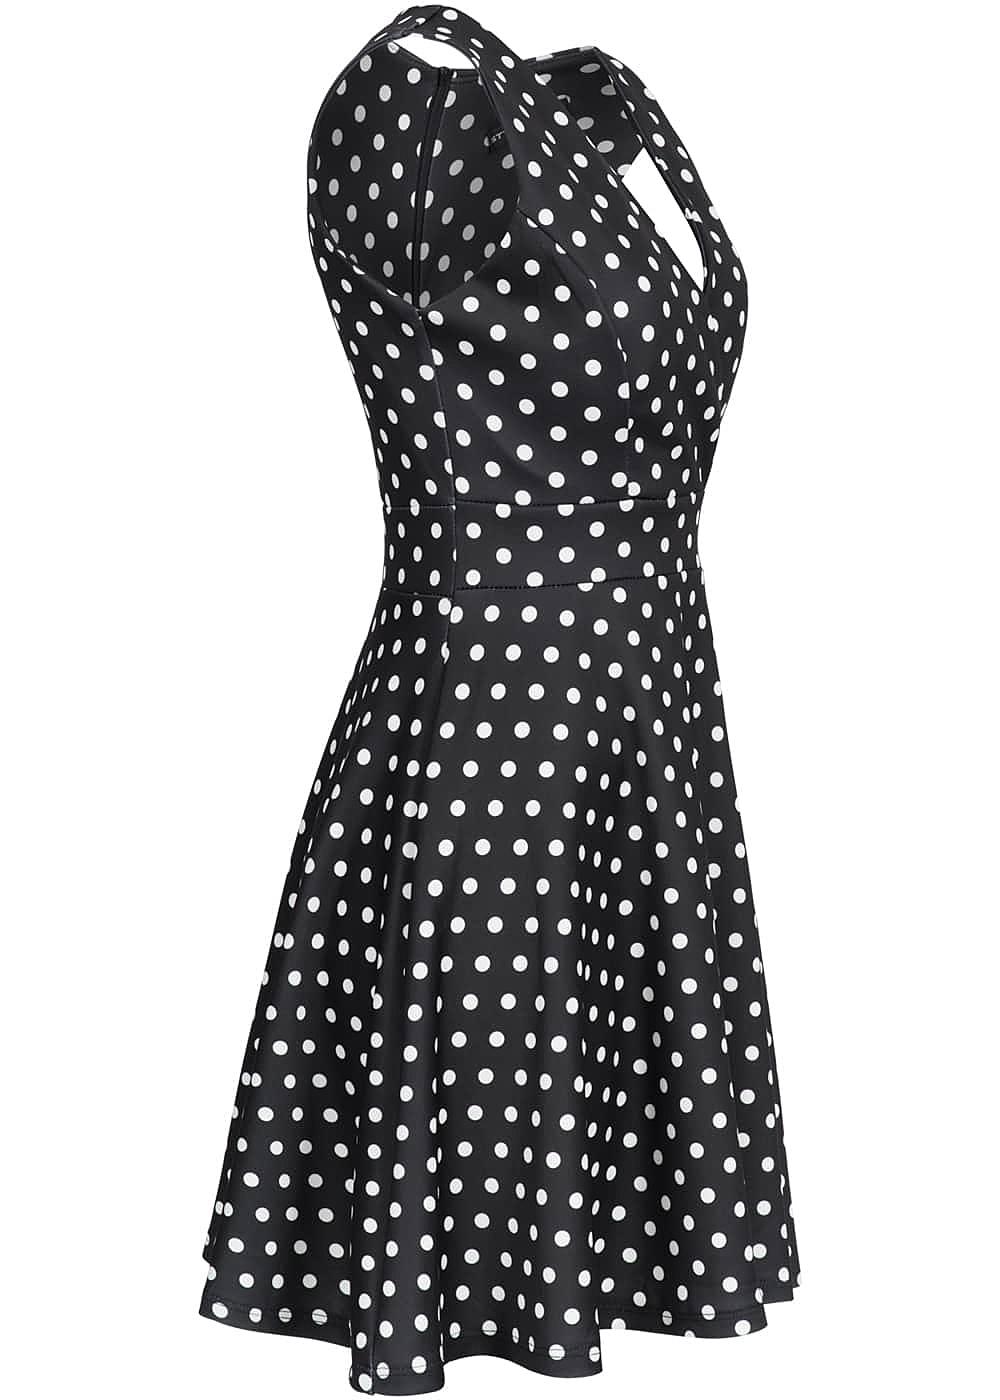 styleboom fashion damen mini kleid punkte muster zipper hinten brustpads schwarz weiss. Black Bedroom Furniture Sets. Home Design Ideas